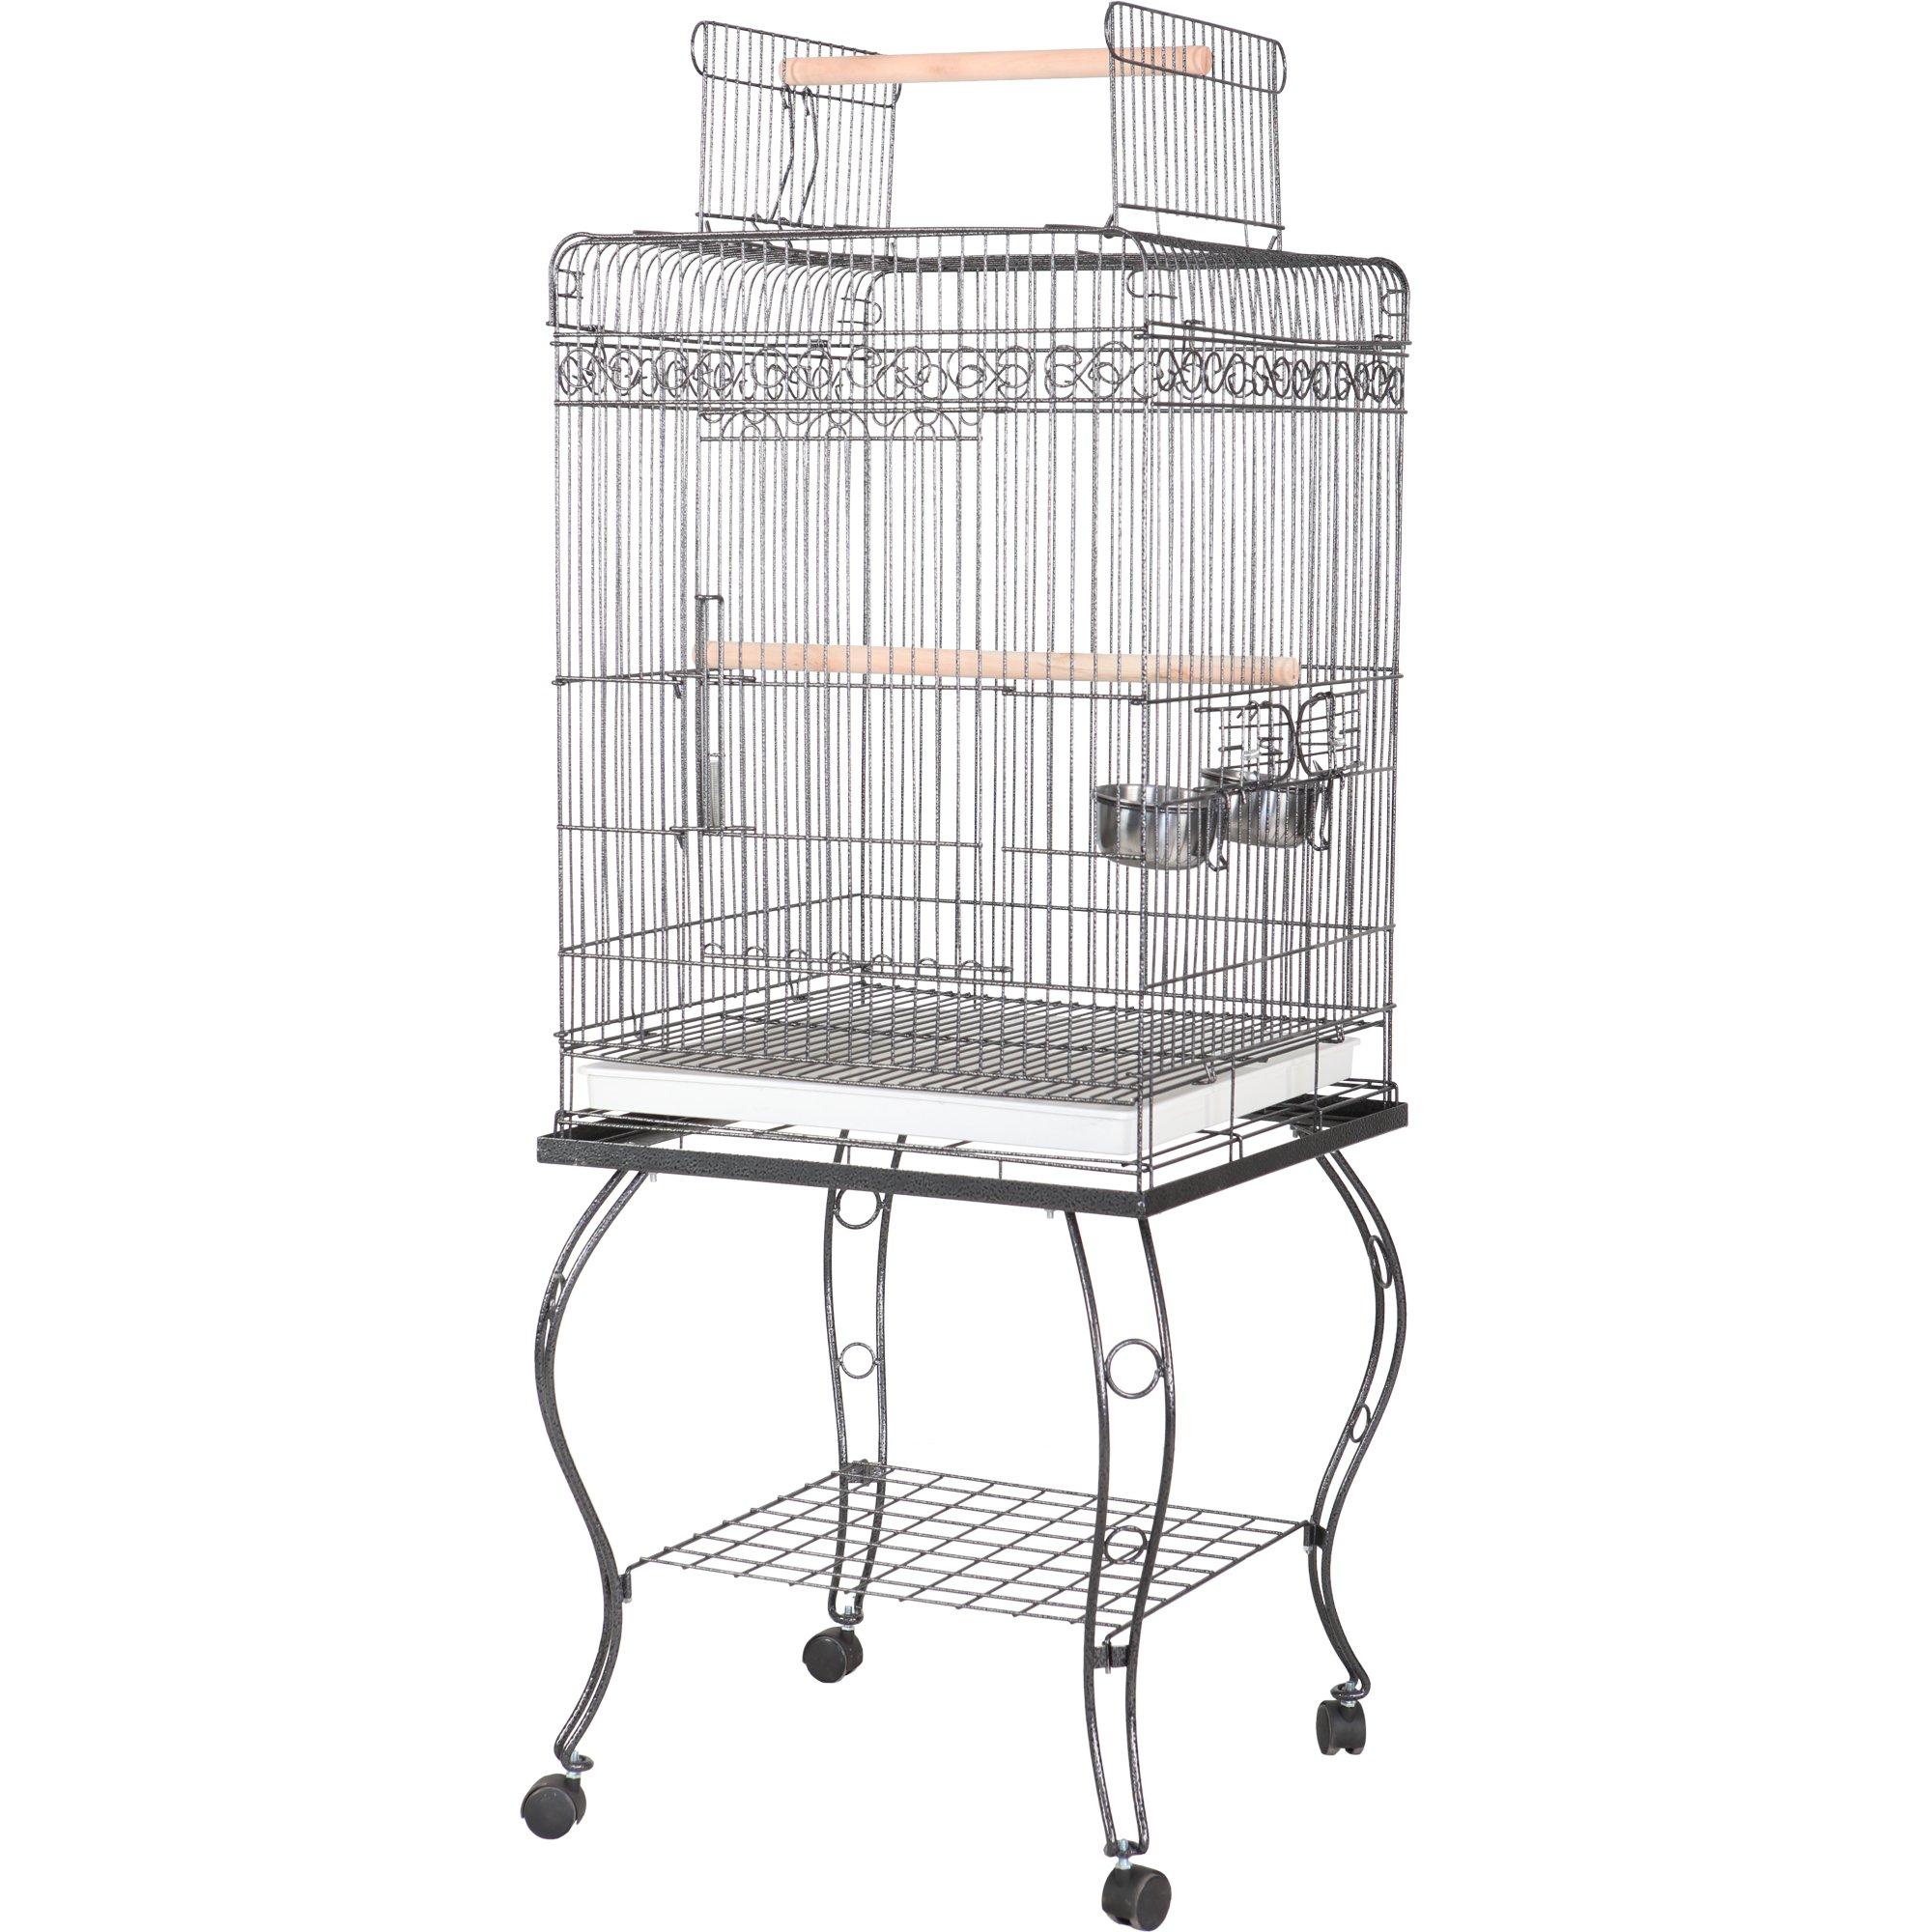 "A&E Cage Company 20"" X 20"" Play Top Bird Cage in White"